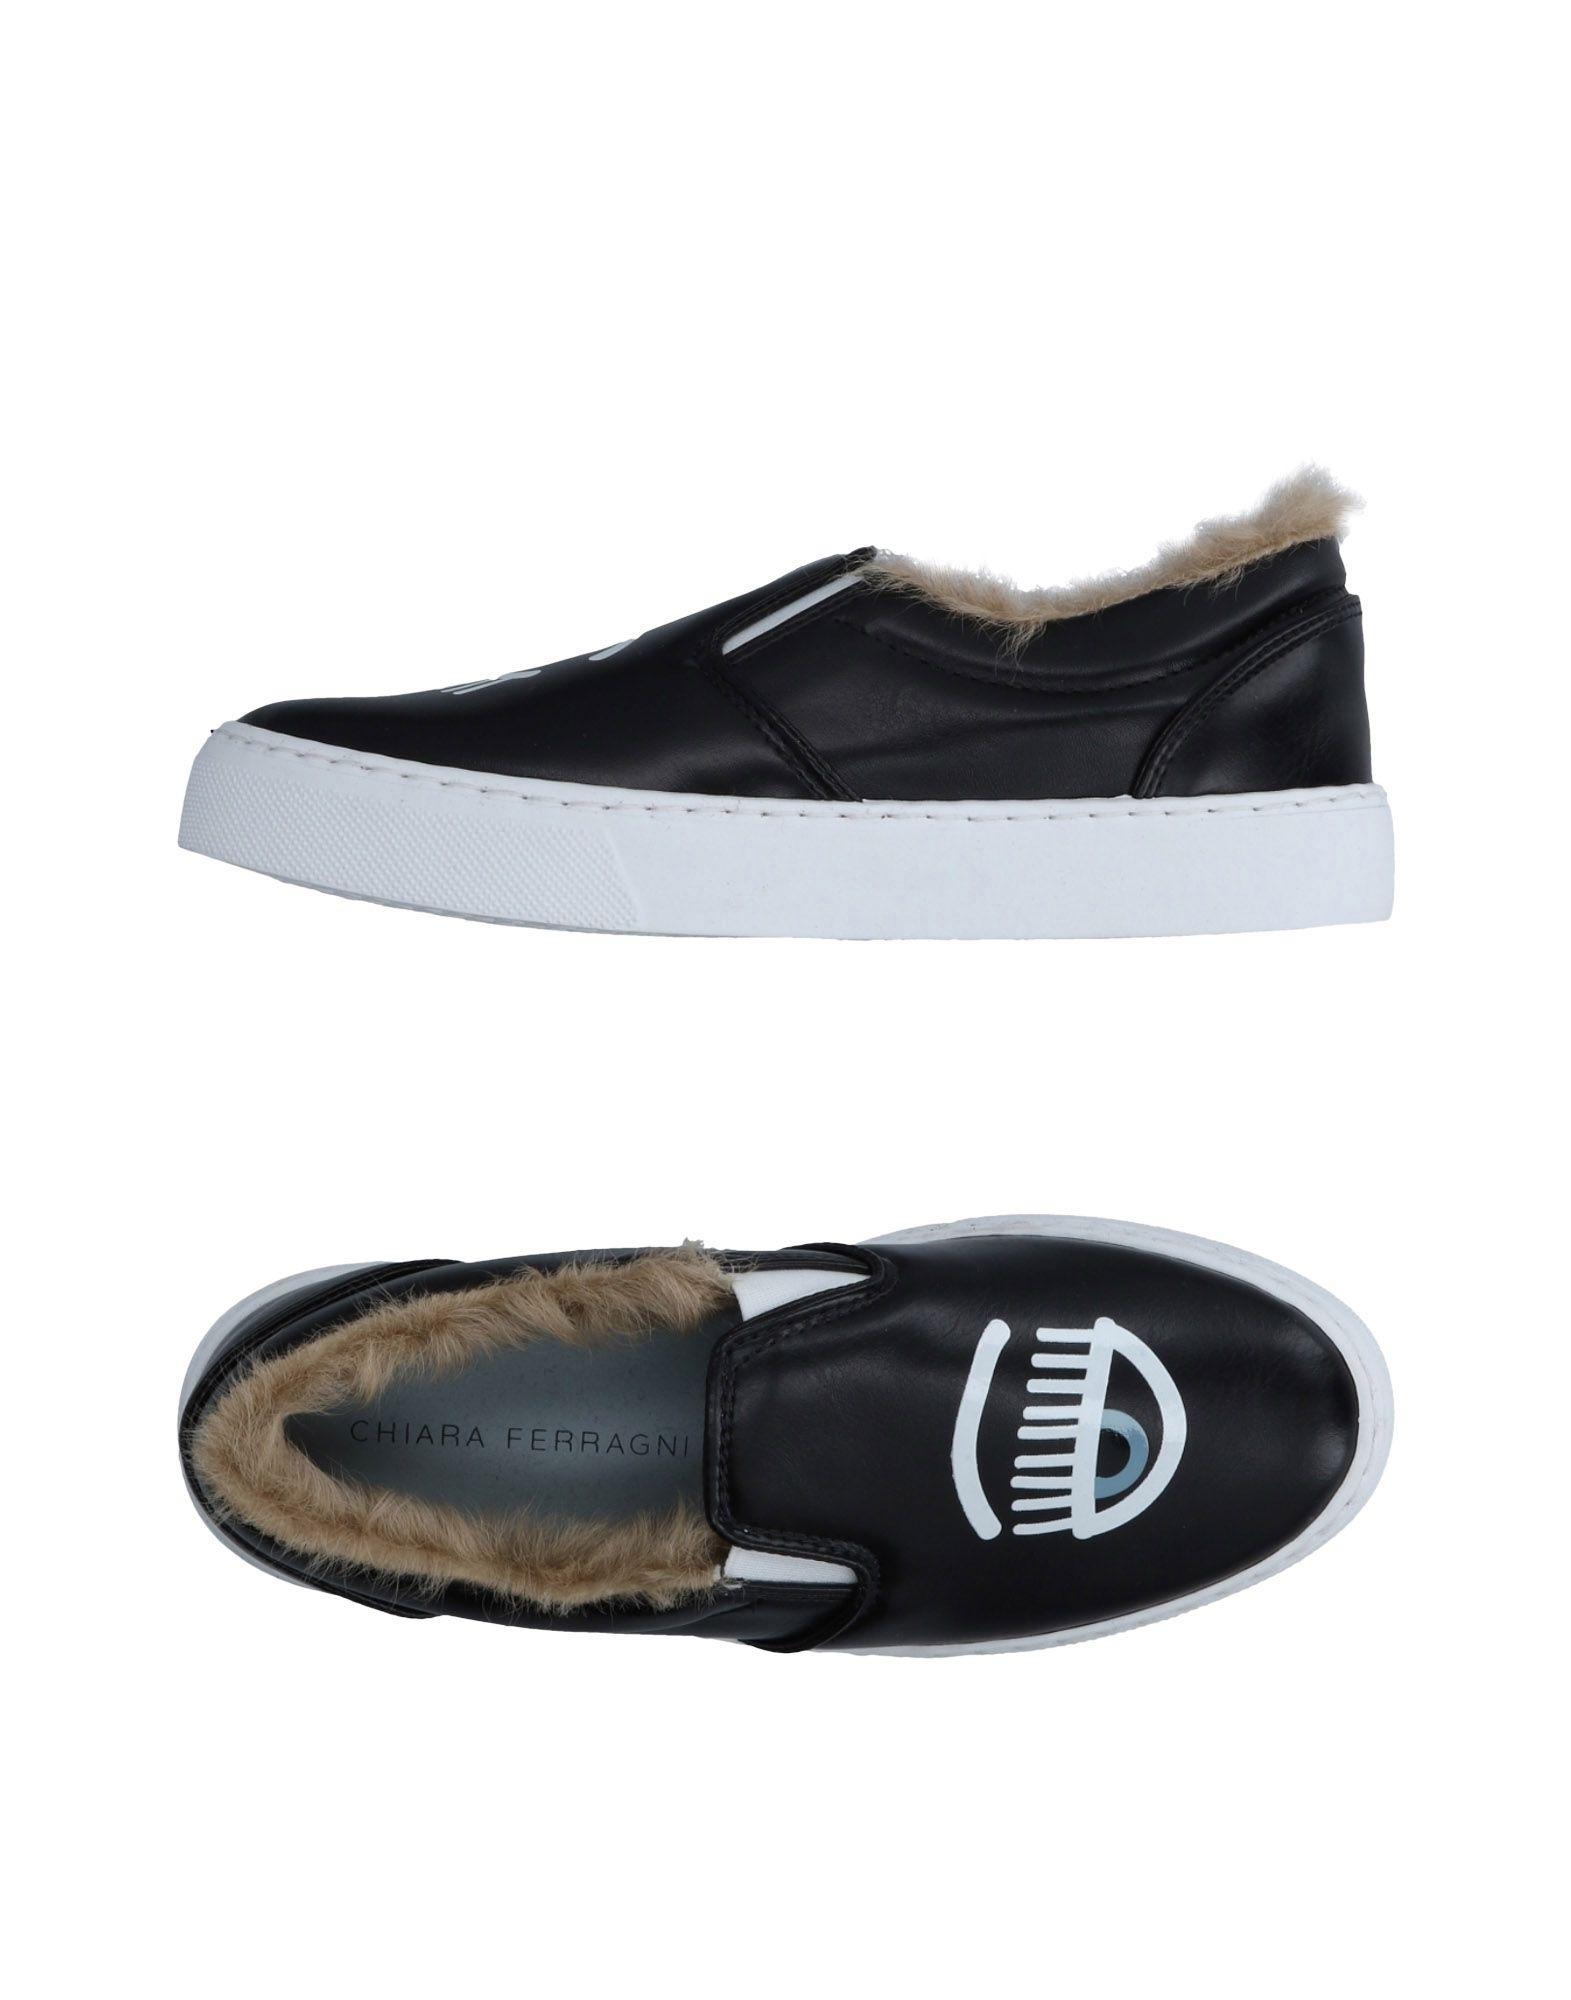 Stilvolle billige Schuhe Chiara Ferragni Sneakers Damen  11476360EO